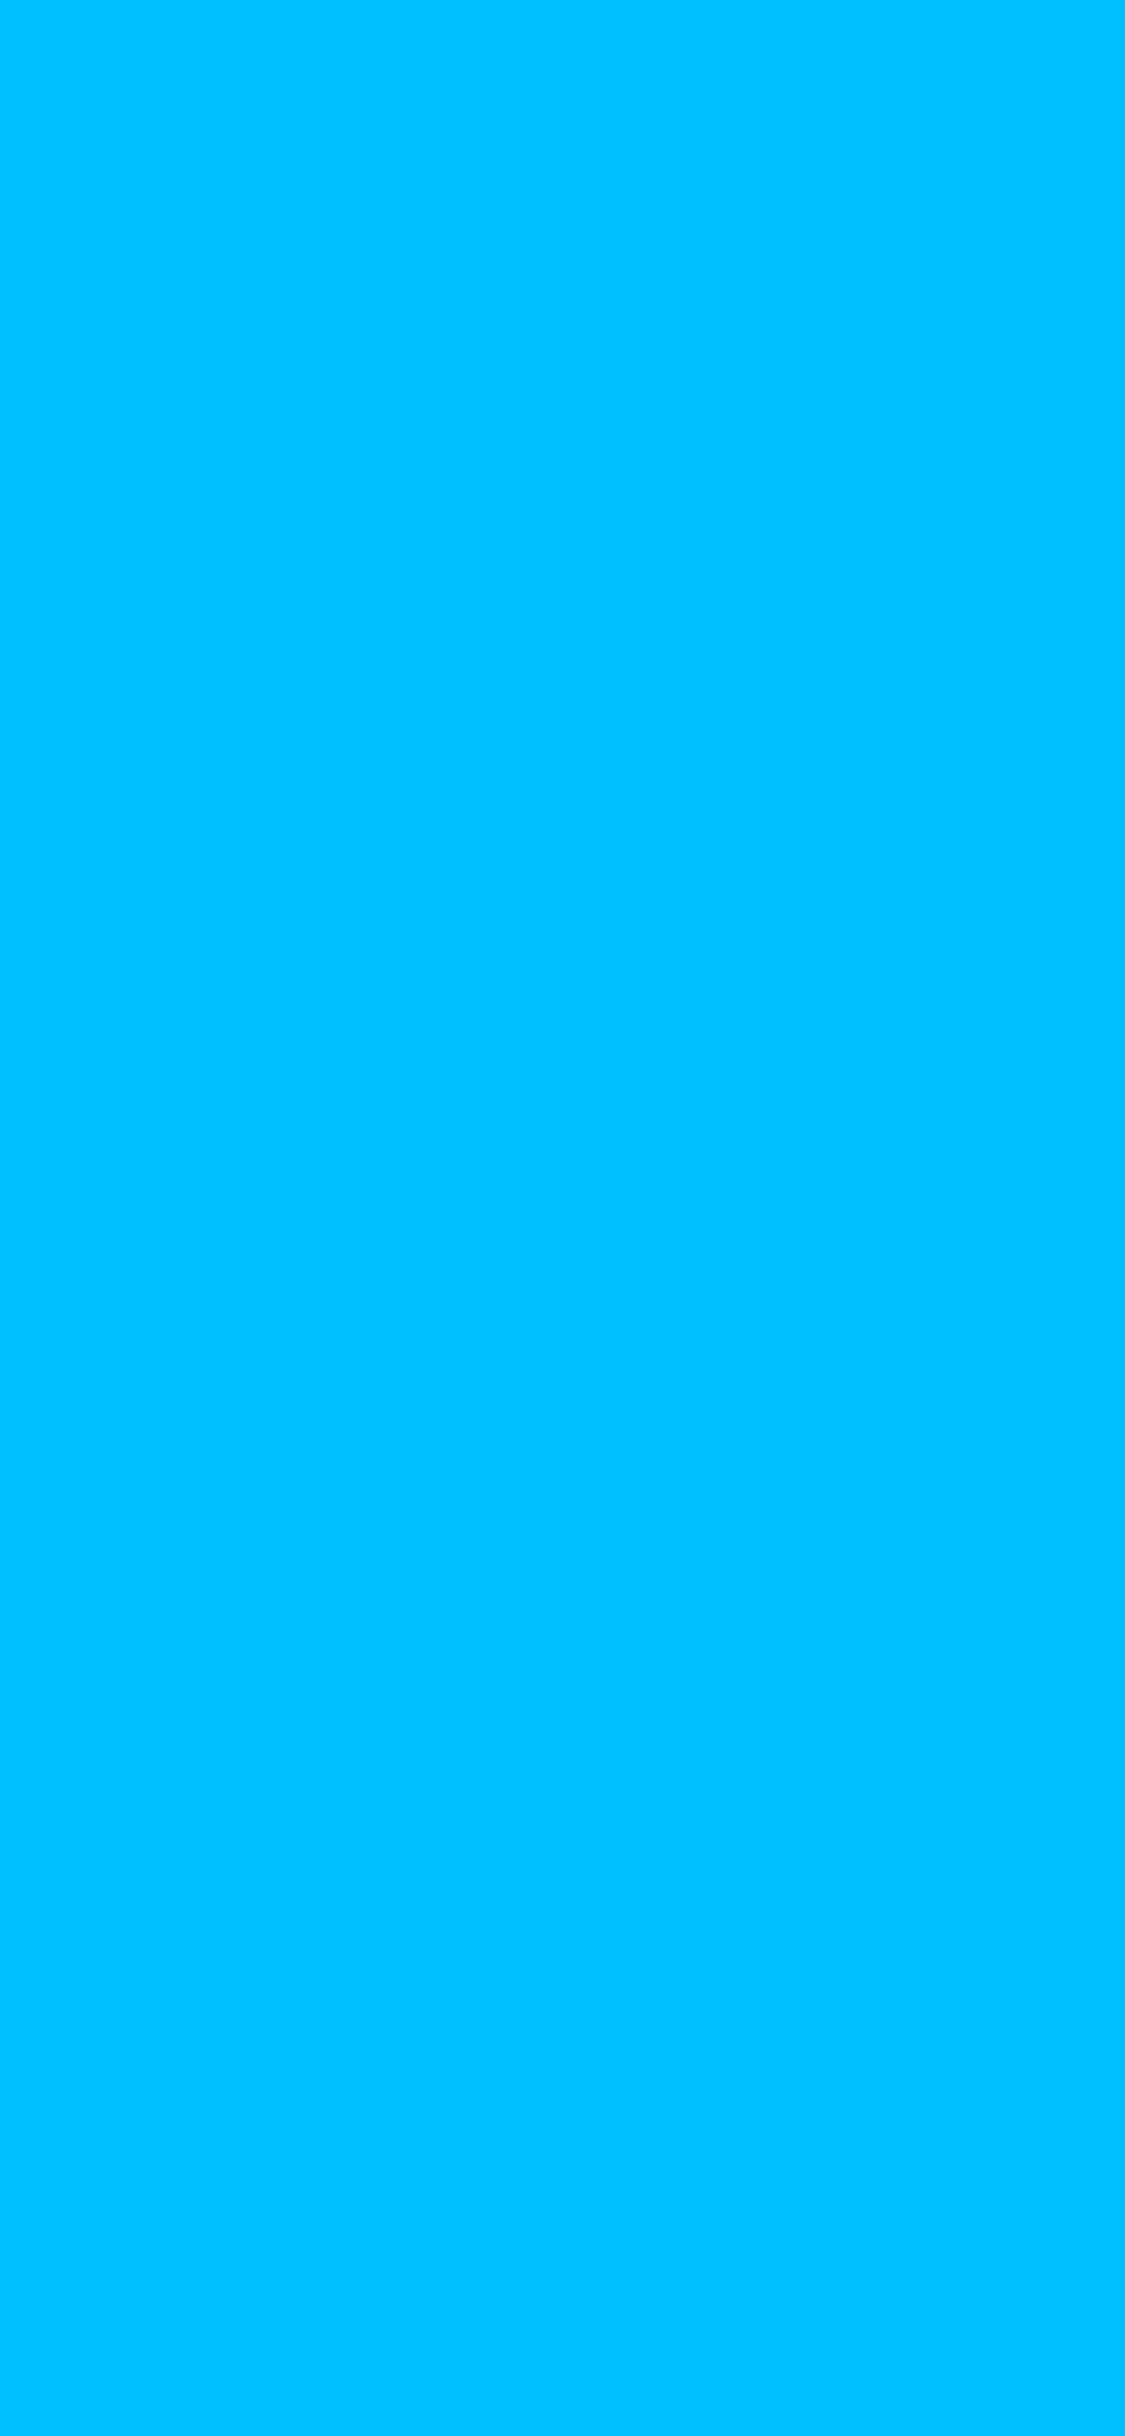 1125x2436 Capri Solid Color Background